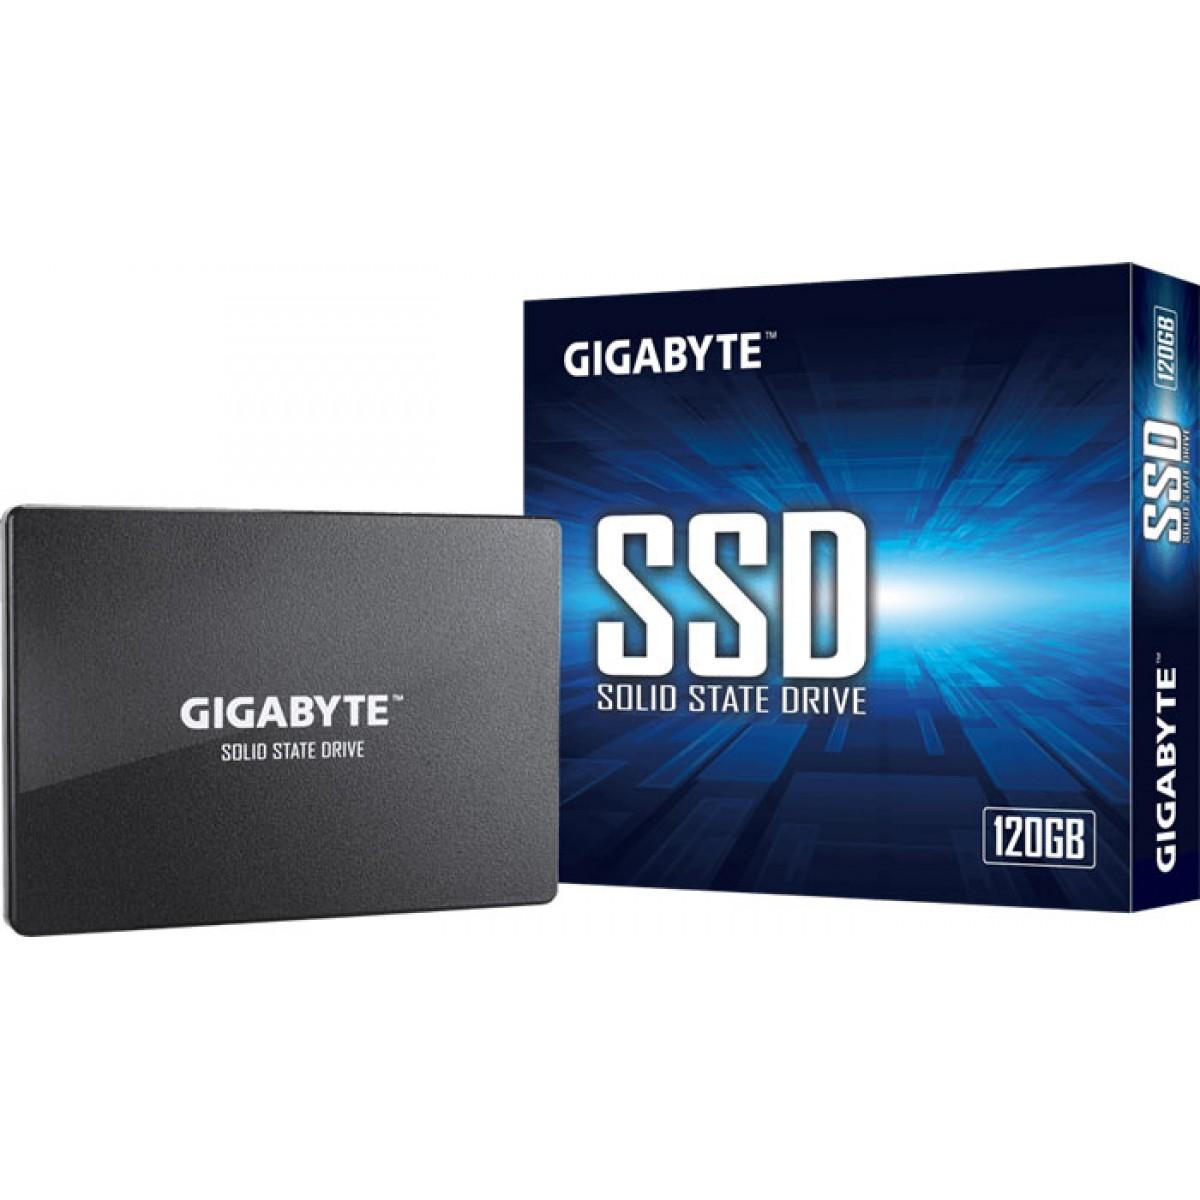 SSD Gigabyte, 120GB, Sata III, Leitura 350MBs e Gravação 280MBs, GP-GSTFS31120GNTD